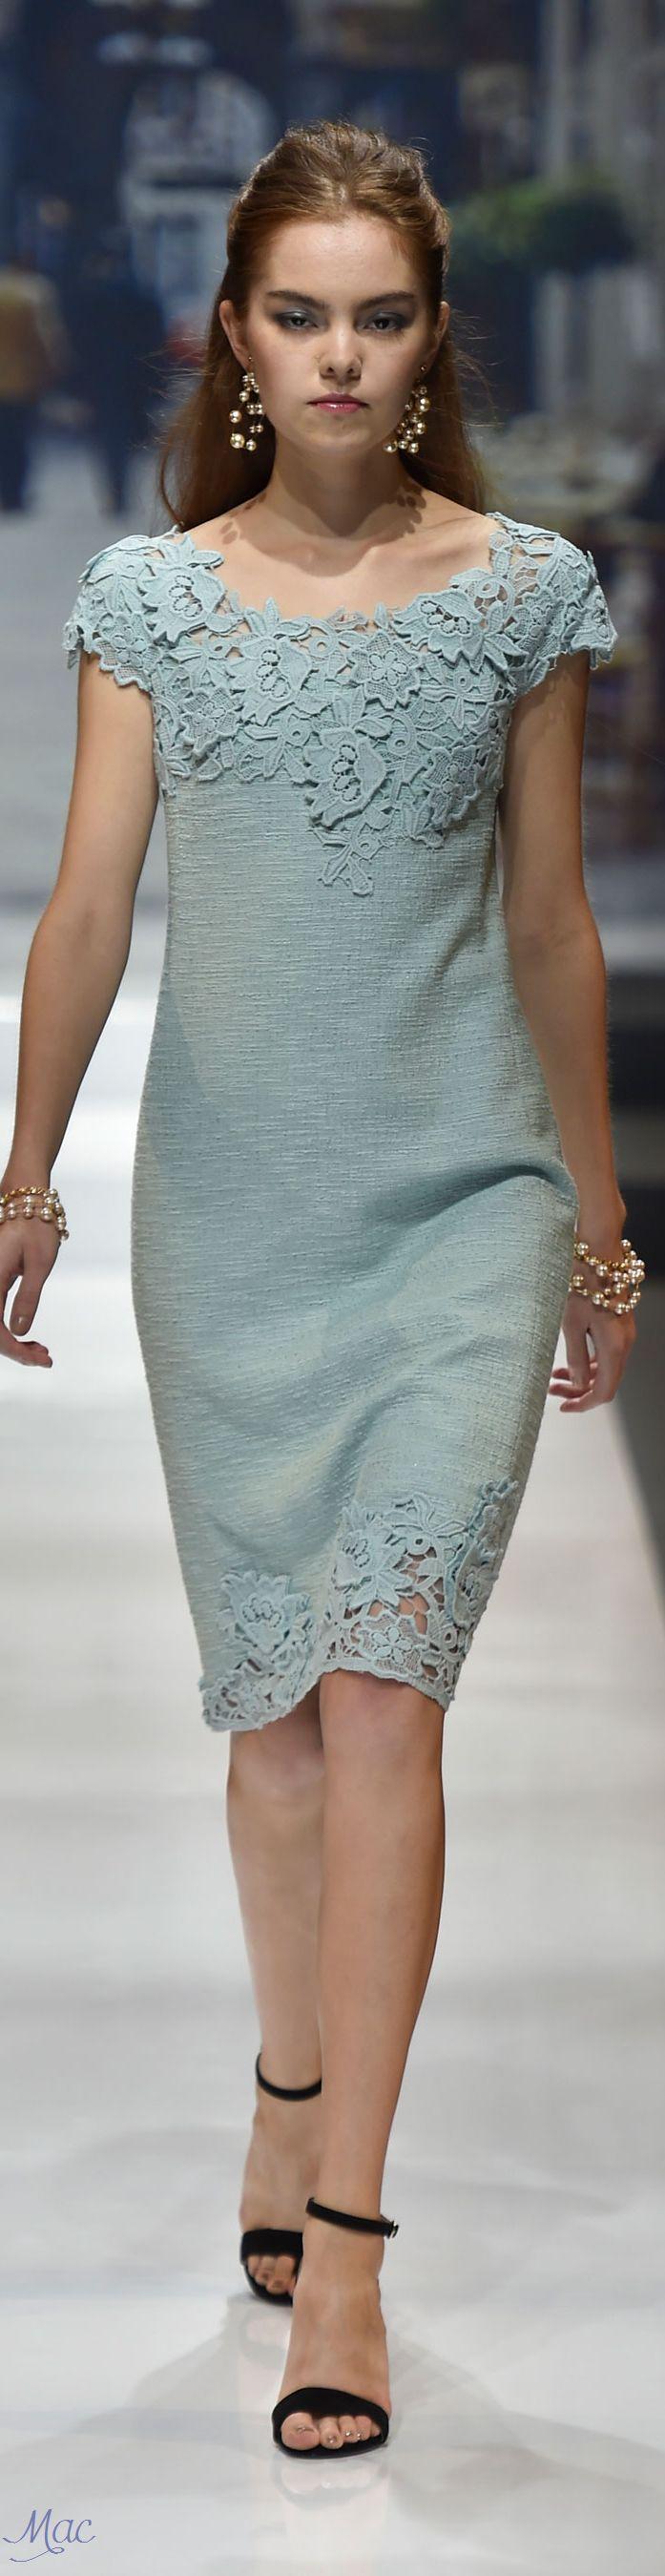 #Farbbberatung #Stilberatung #Farbenreich mit www.farben-reich.com Spring 2017 Ready-to-Wear Yuki Torii International